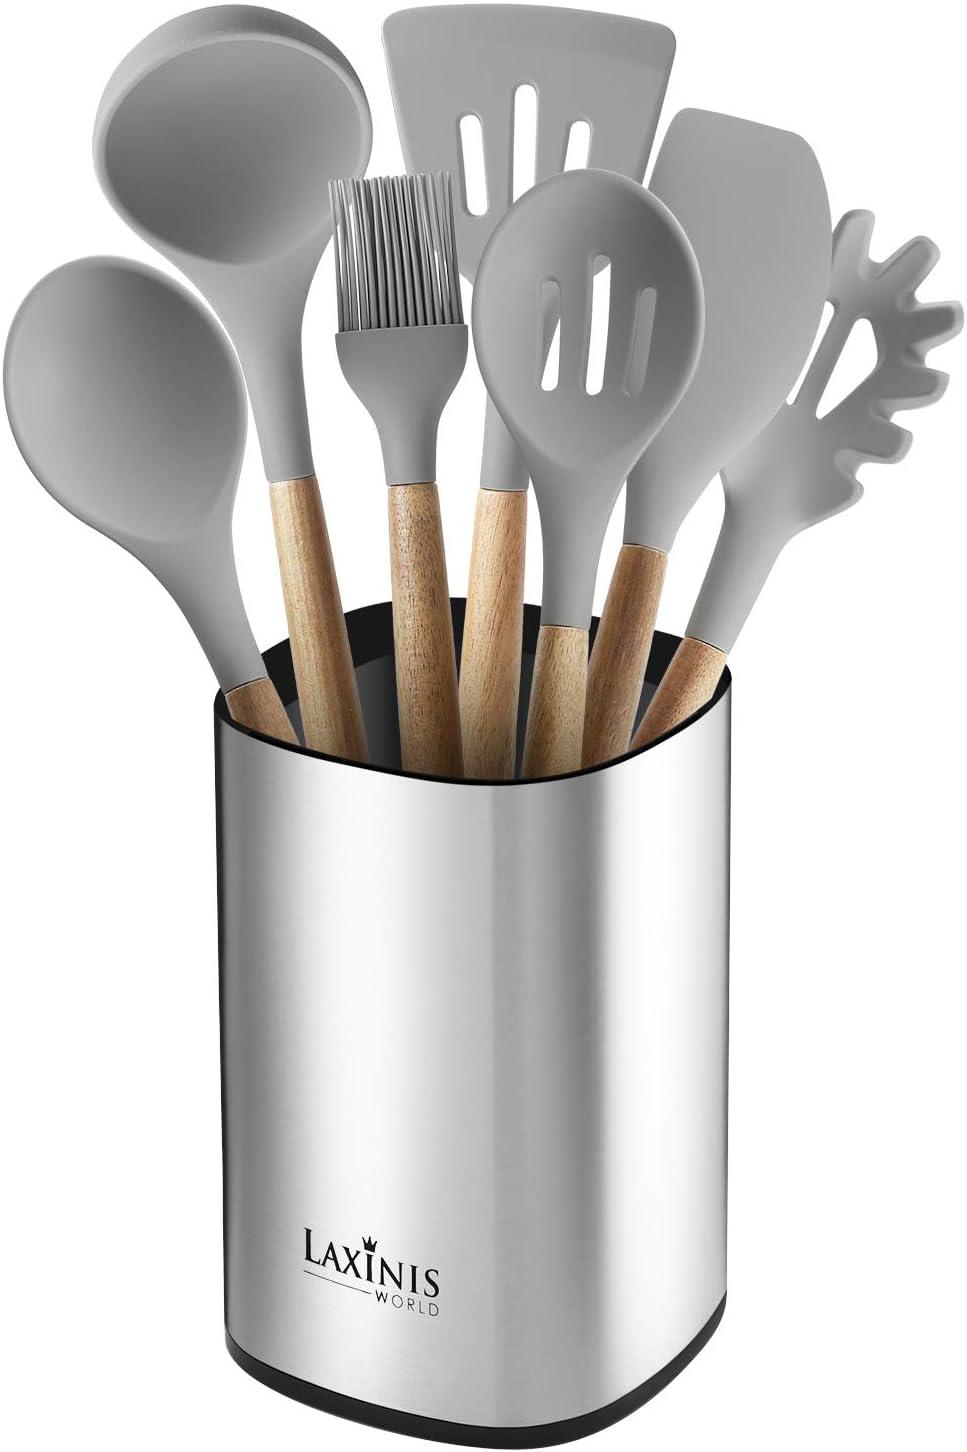 "Stainless Steel Kitchen Utensil Holder, Kitchen Caddy, Large Utensil Organizer, Modern Rectangular Design, 6.1"" by 5"" Utensils Crock"